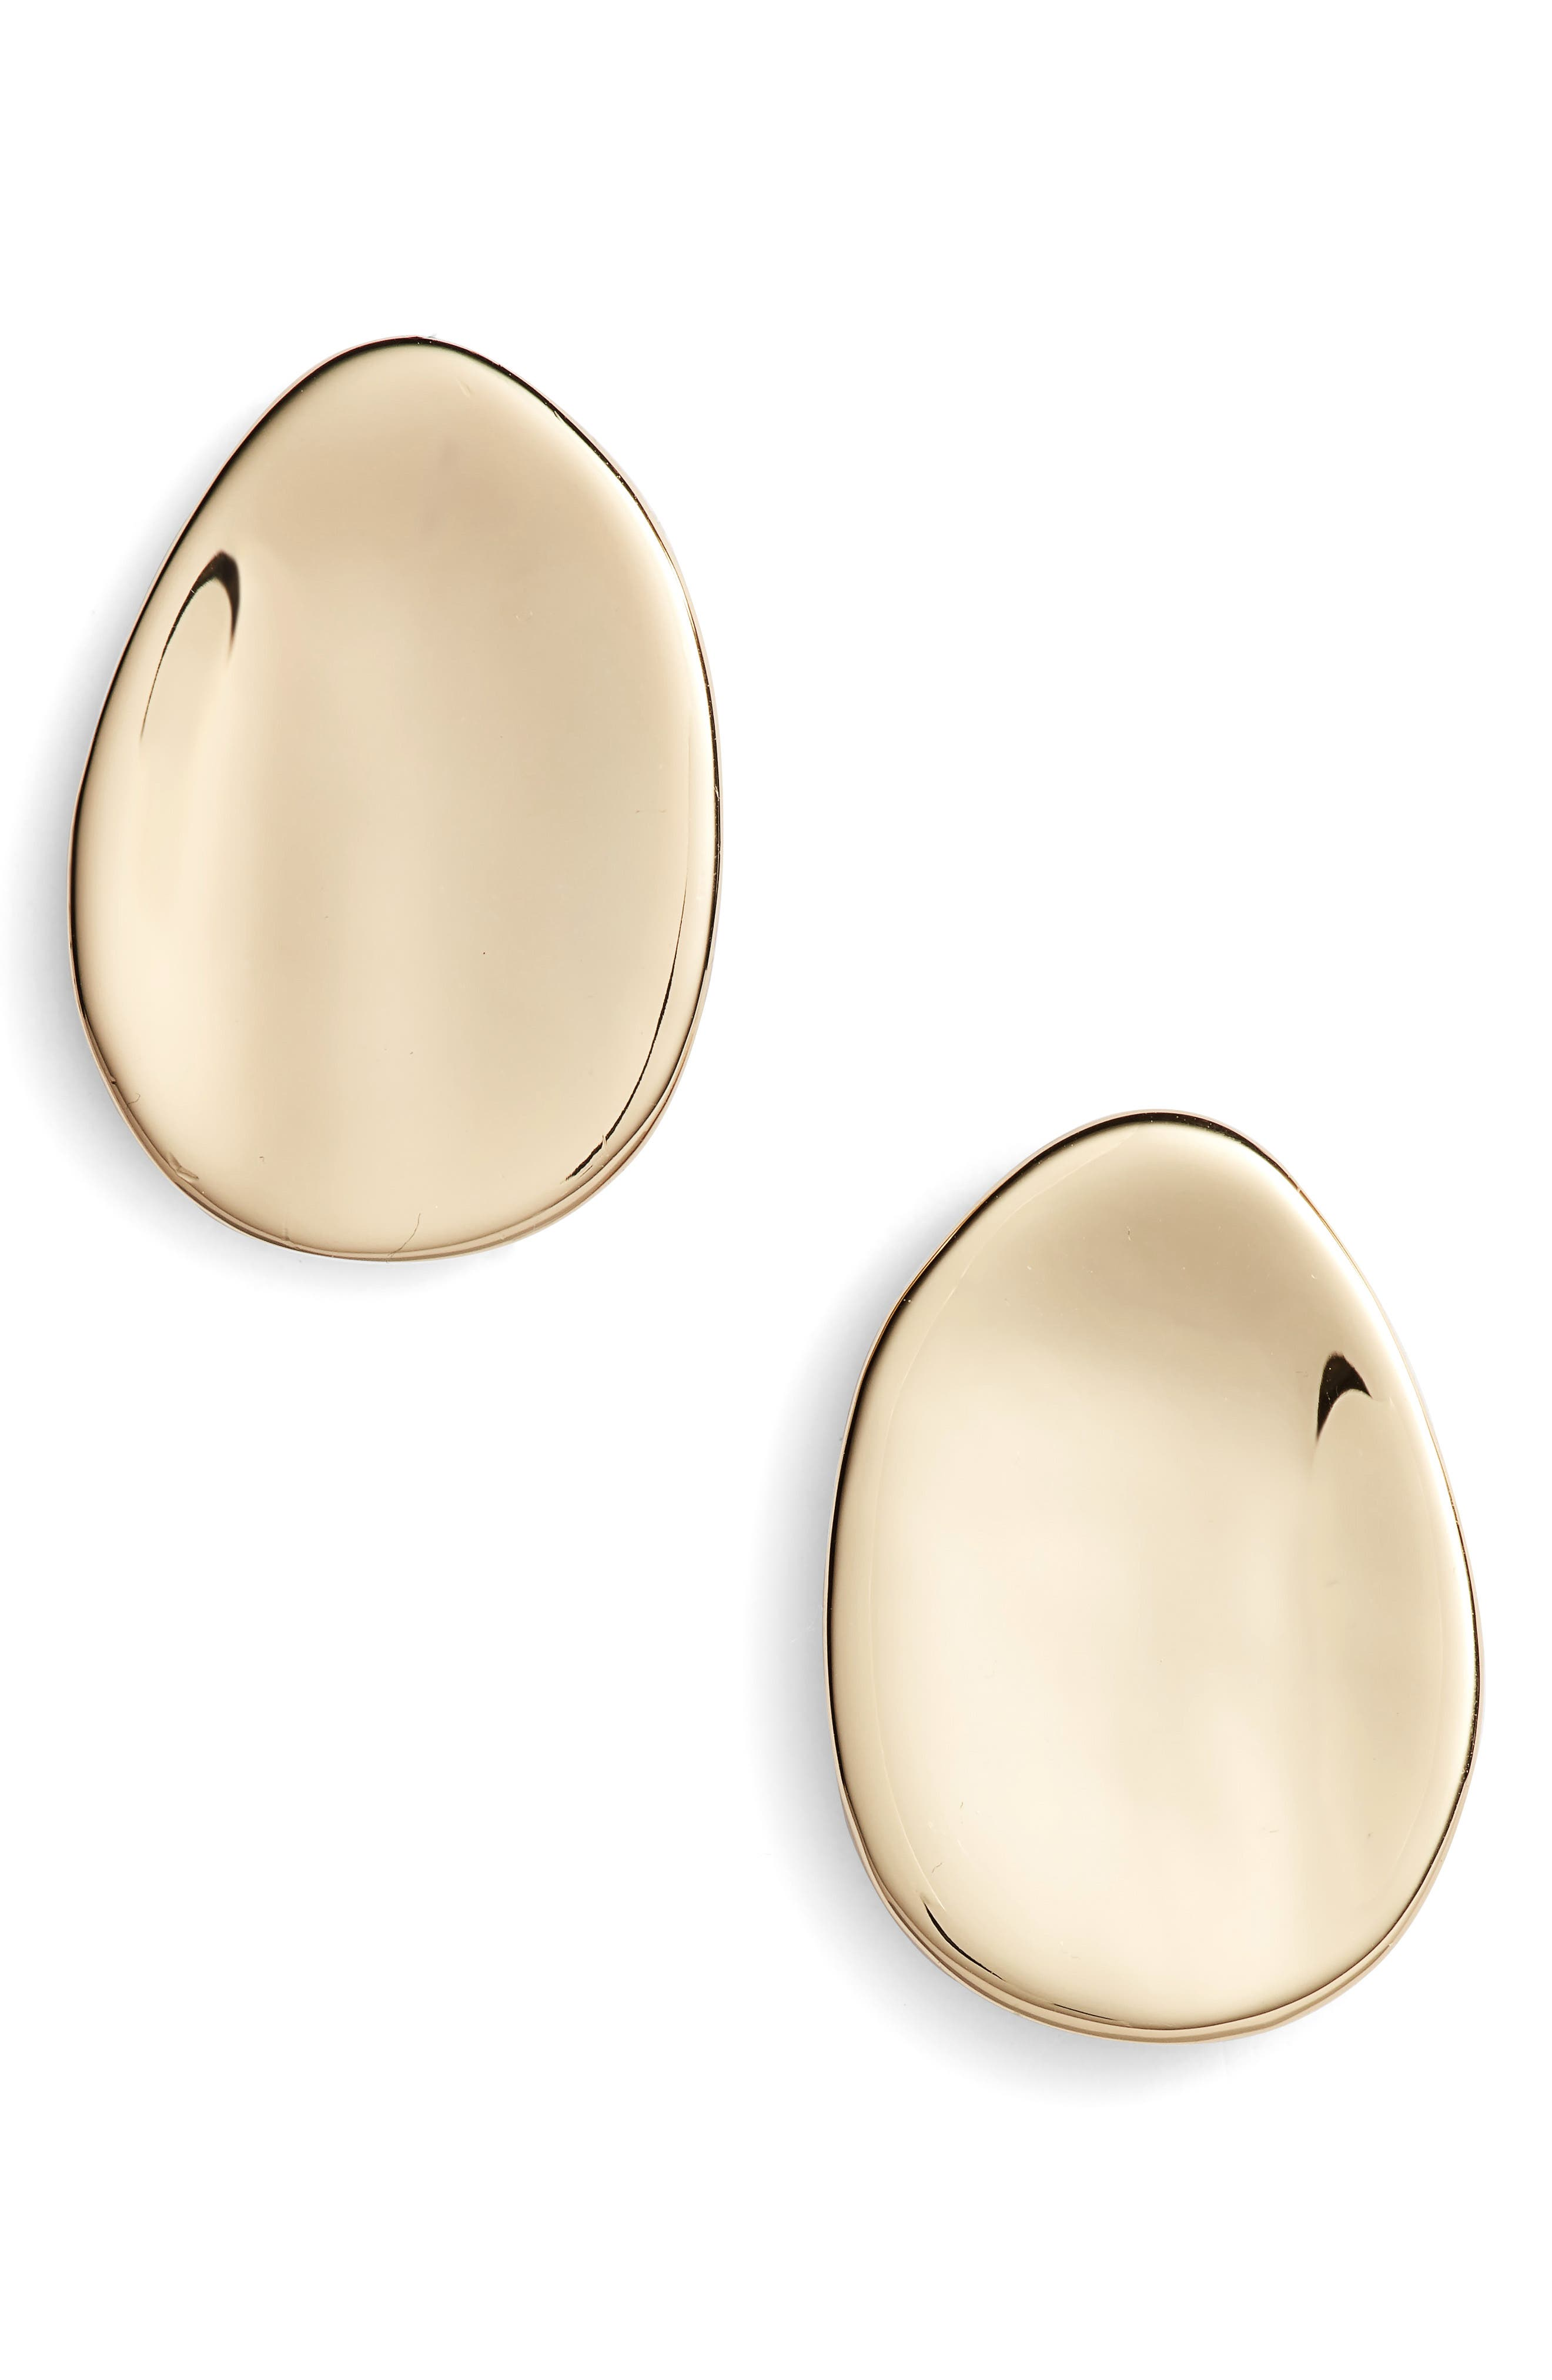 Dish Stud Earrings,                         Main,                         color, 710